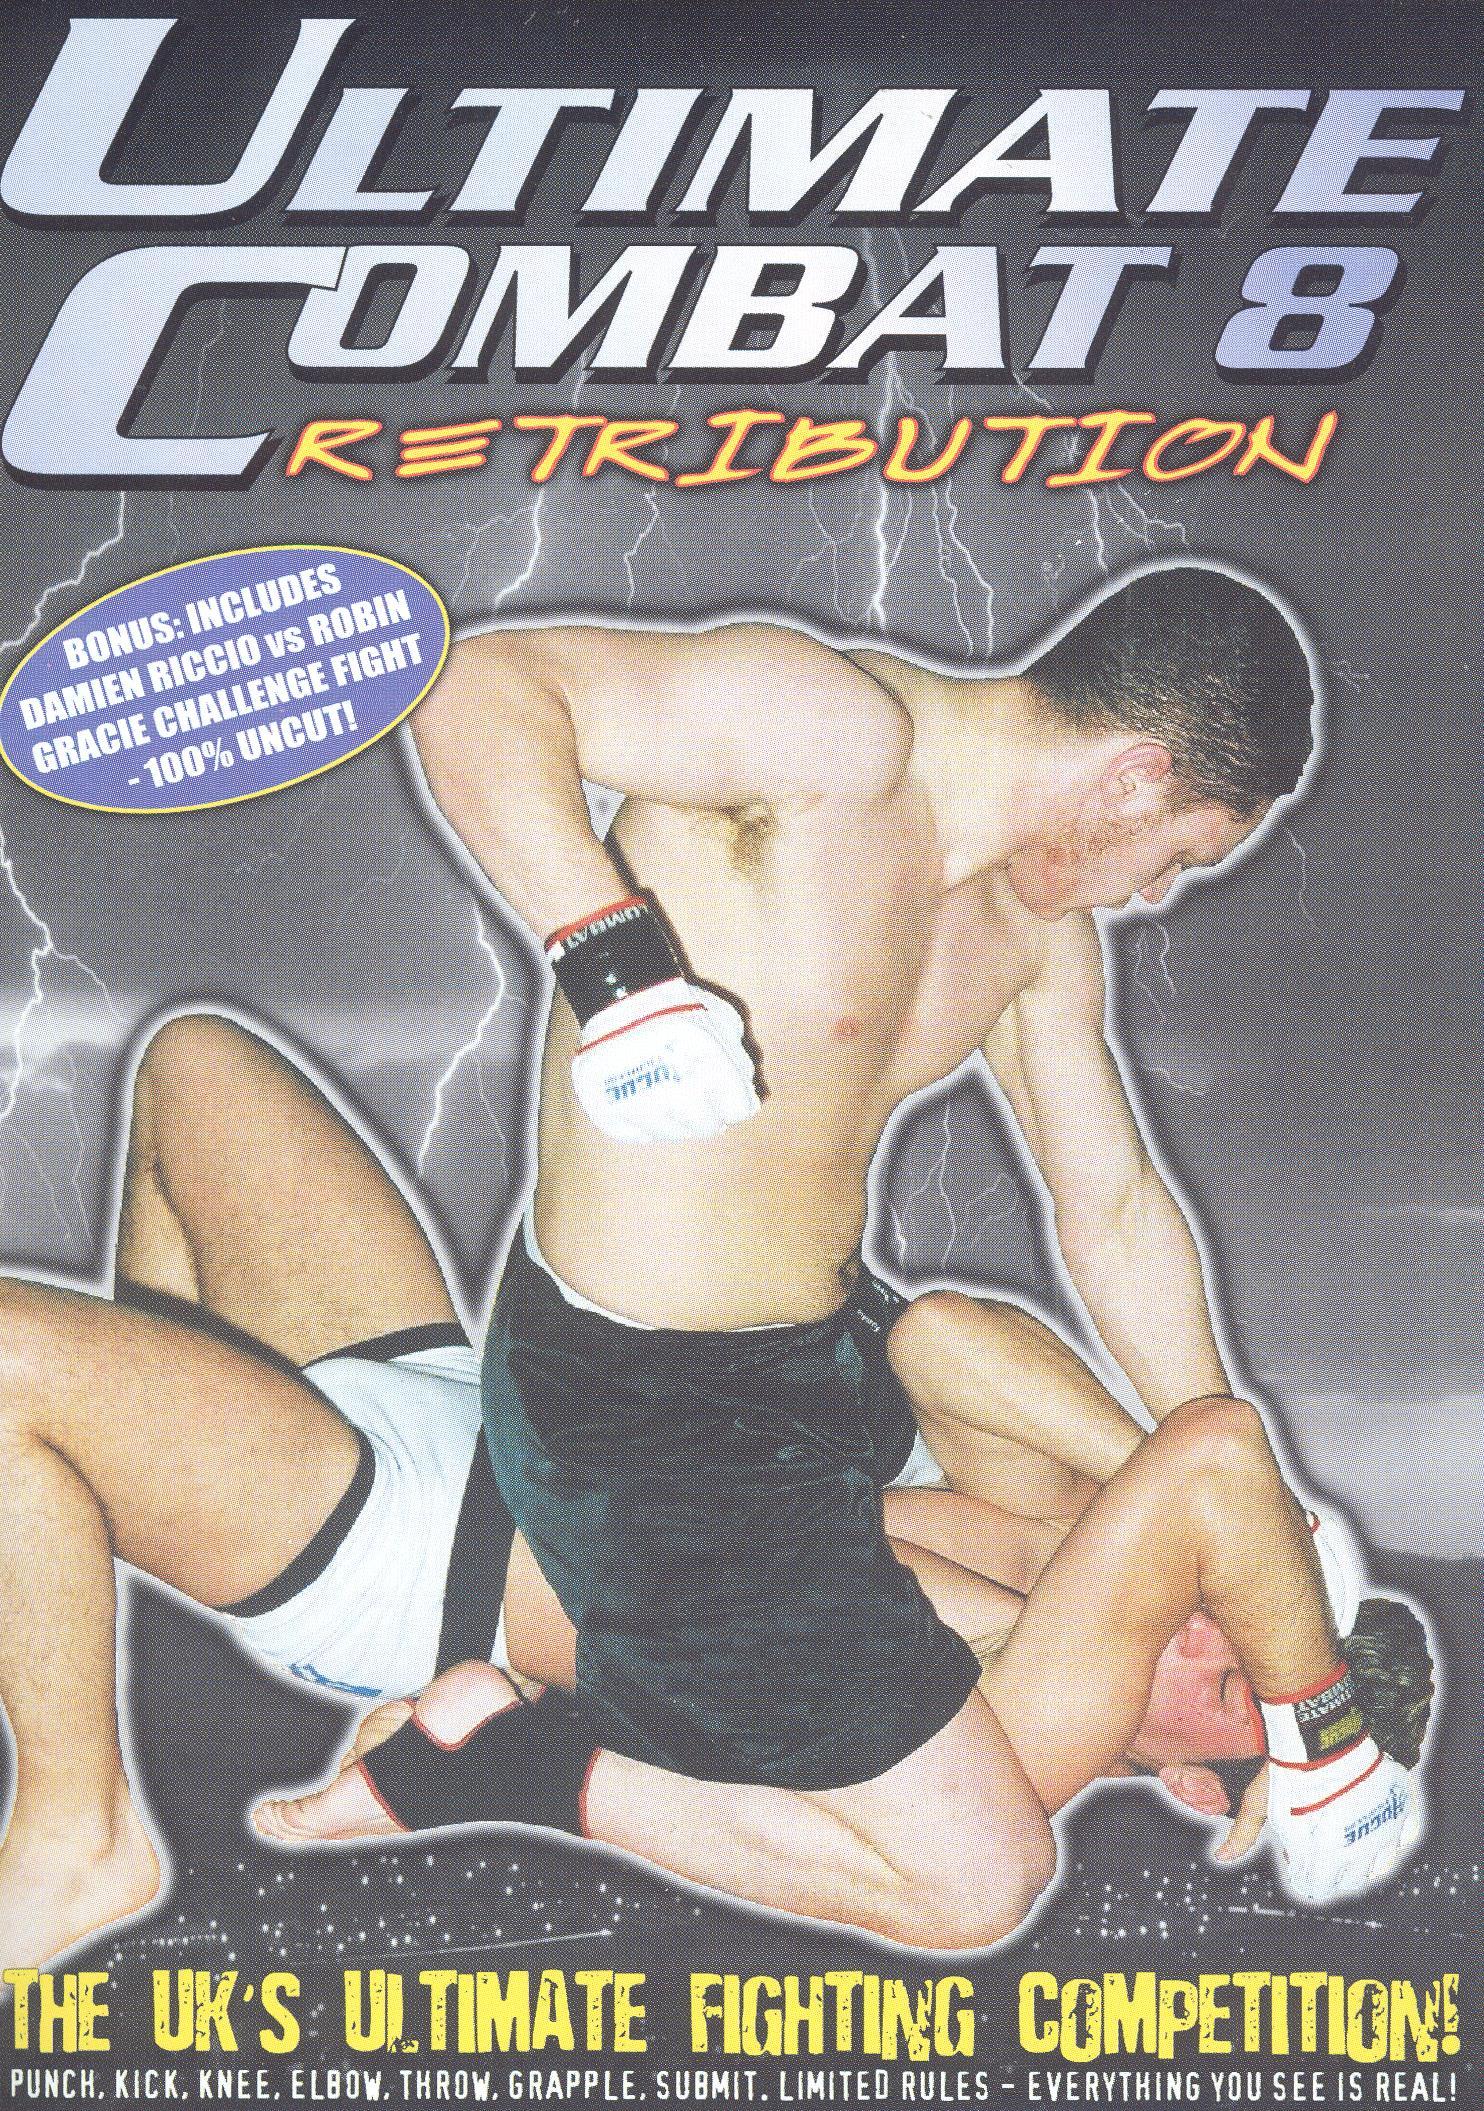 Ultimate Combat 8: Retribution